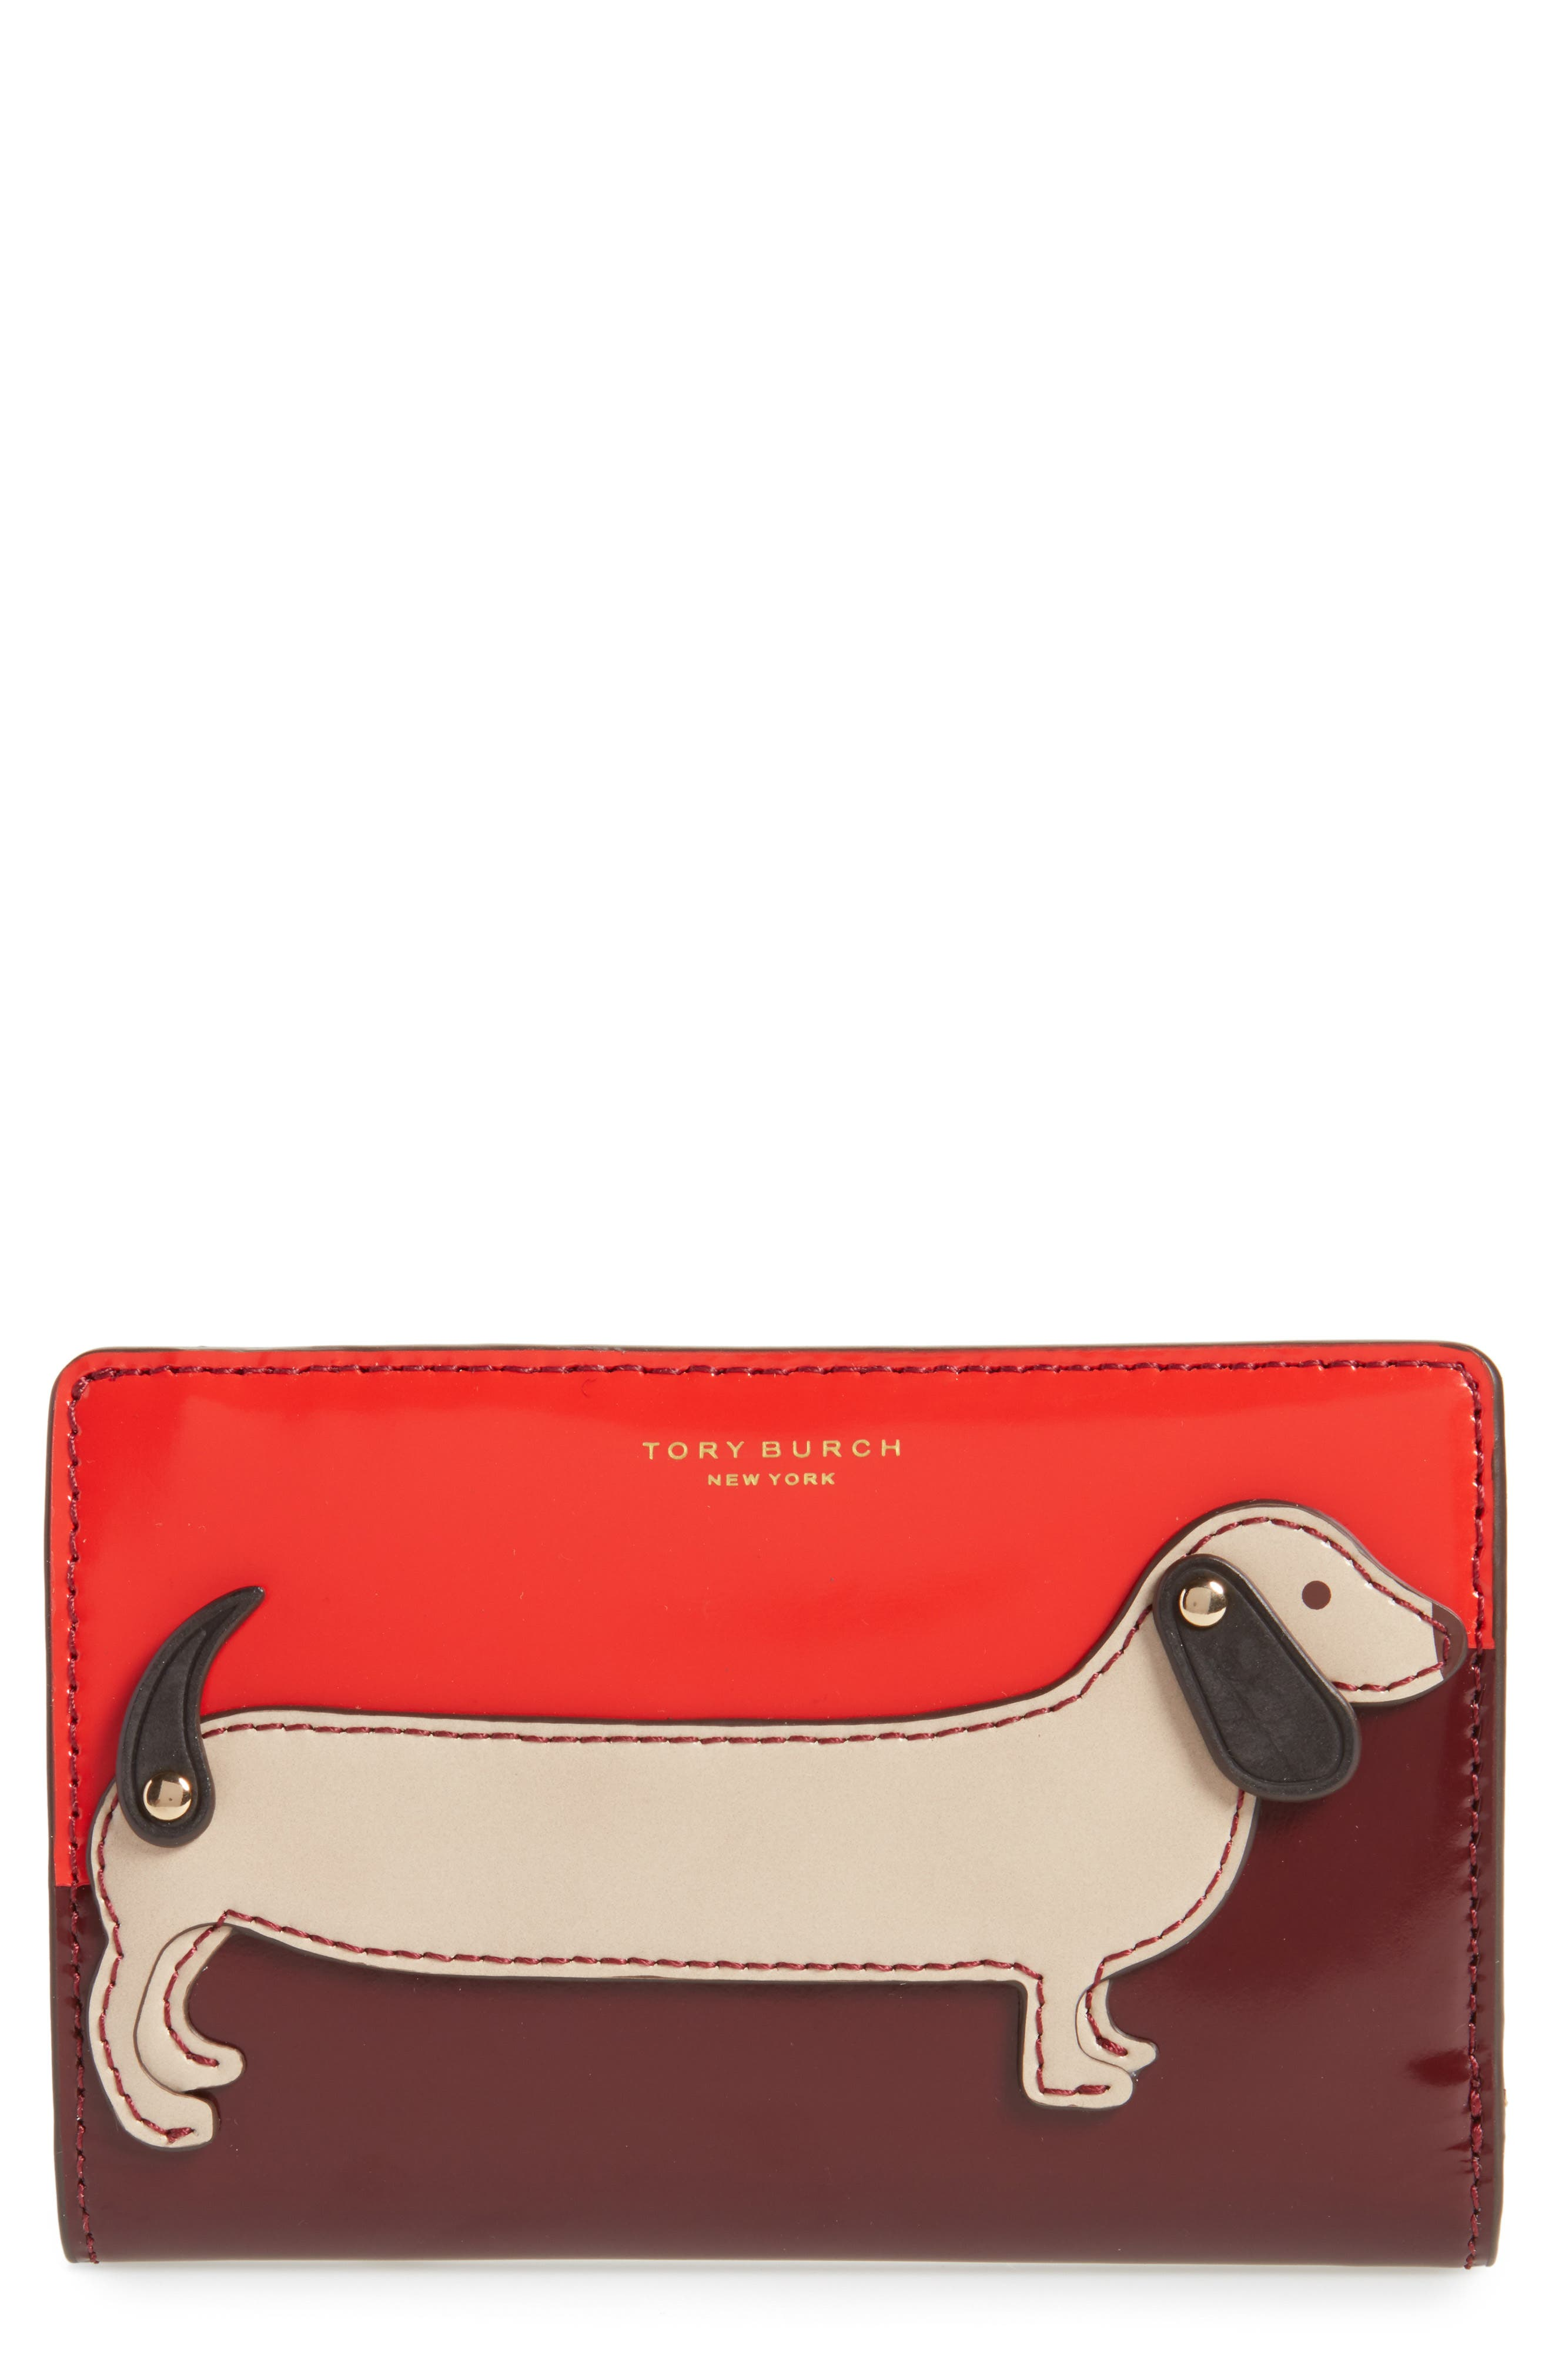 Medium McGraw Dachshund Slim Leather Wallet,                         Main,                         color, 600